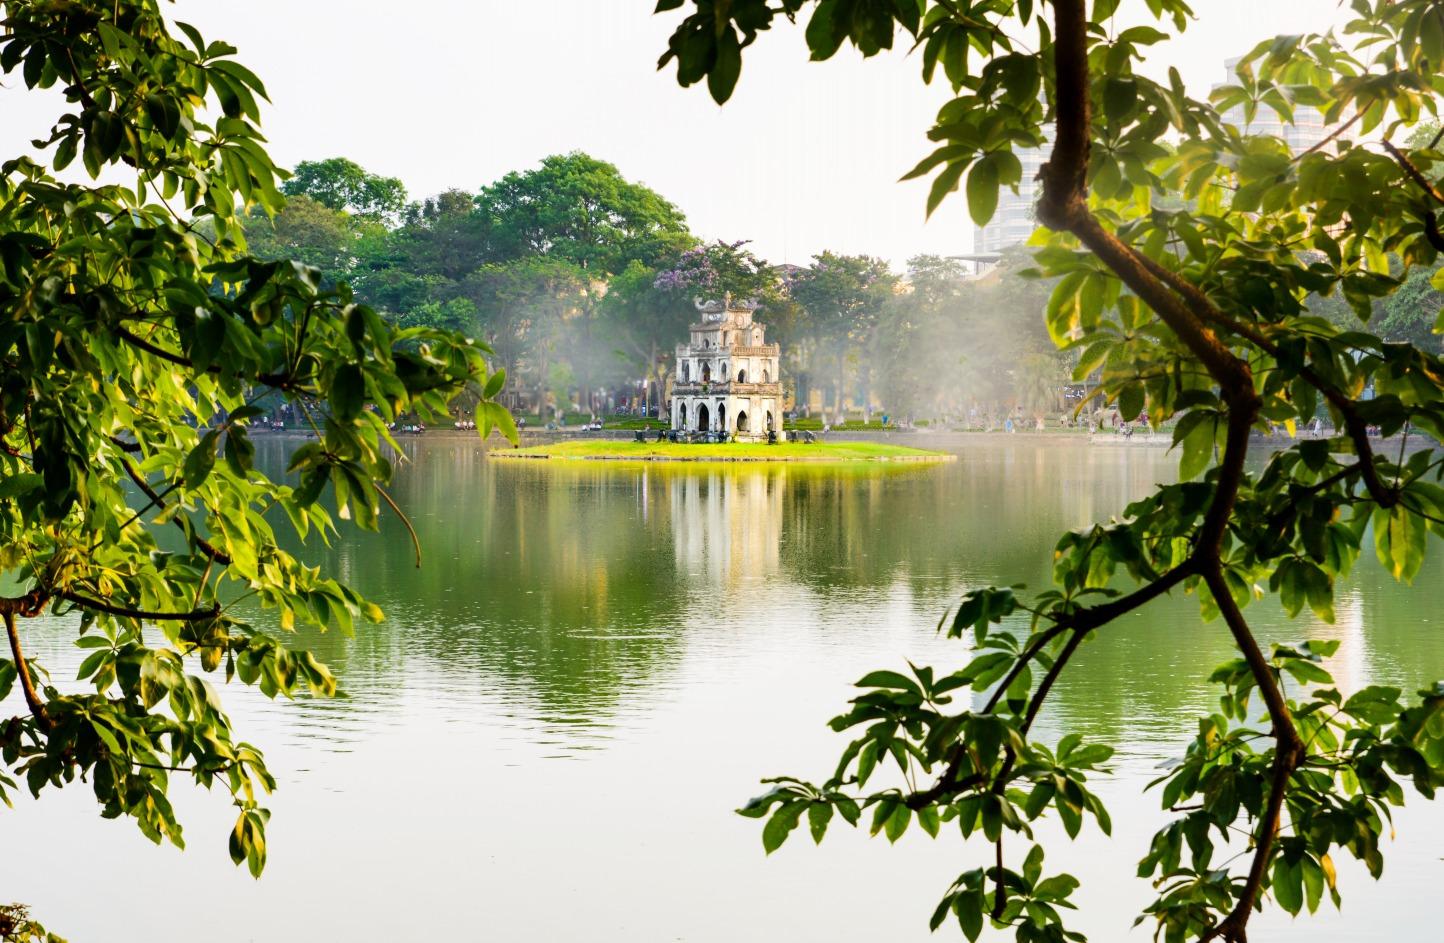 Hoan Kiem lake, best place to visit in Hanoi